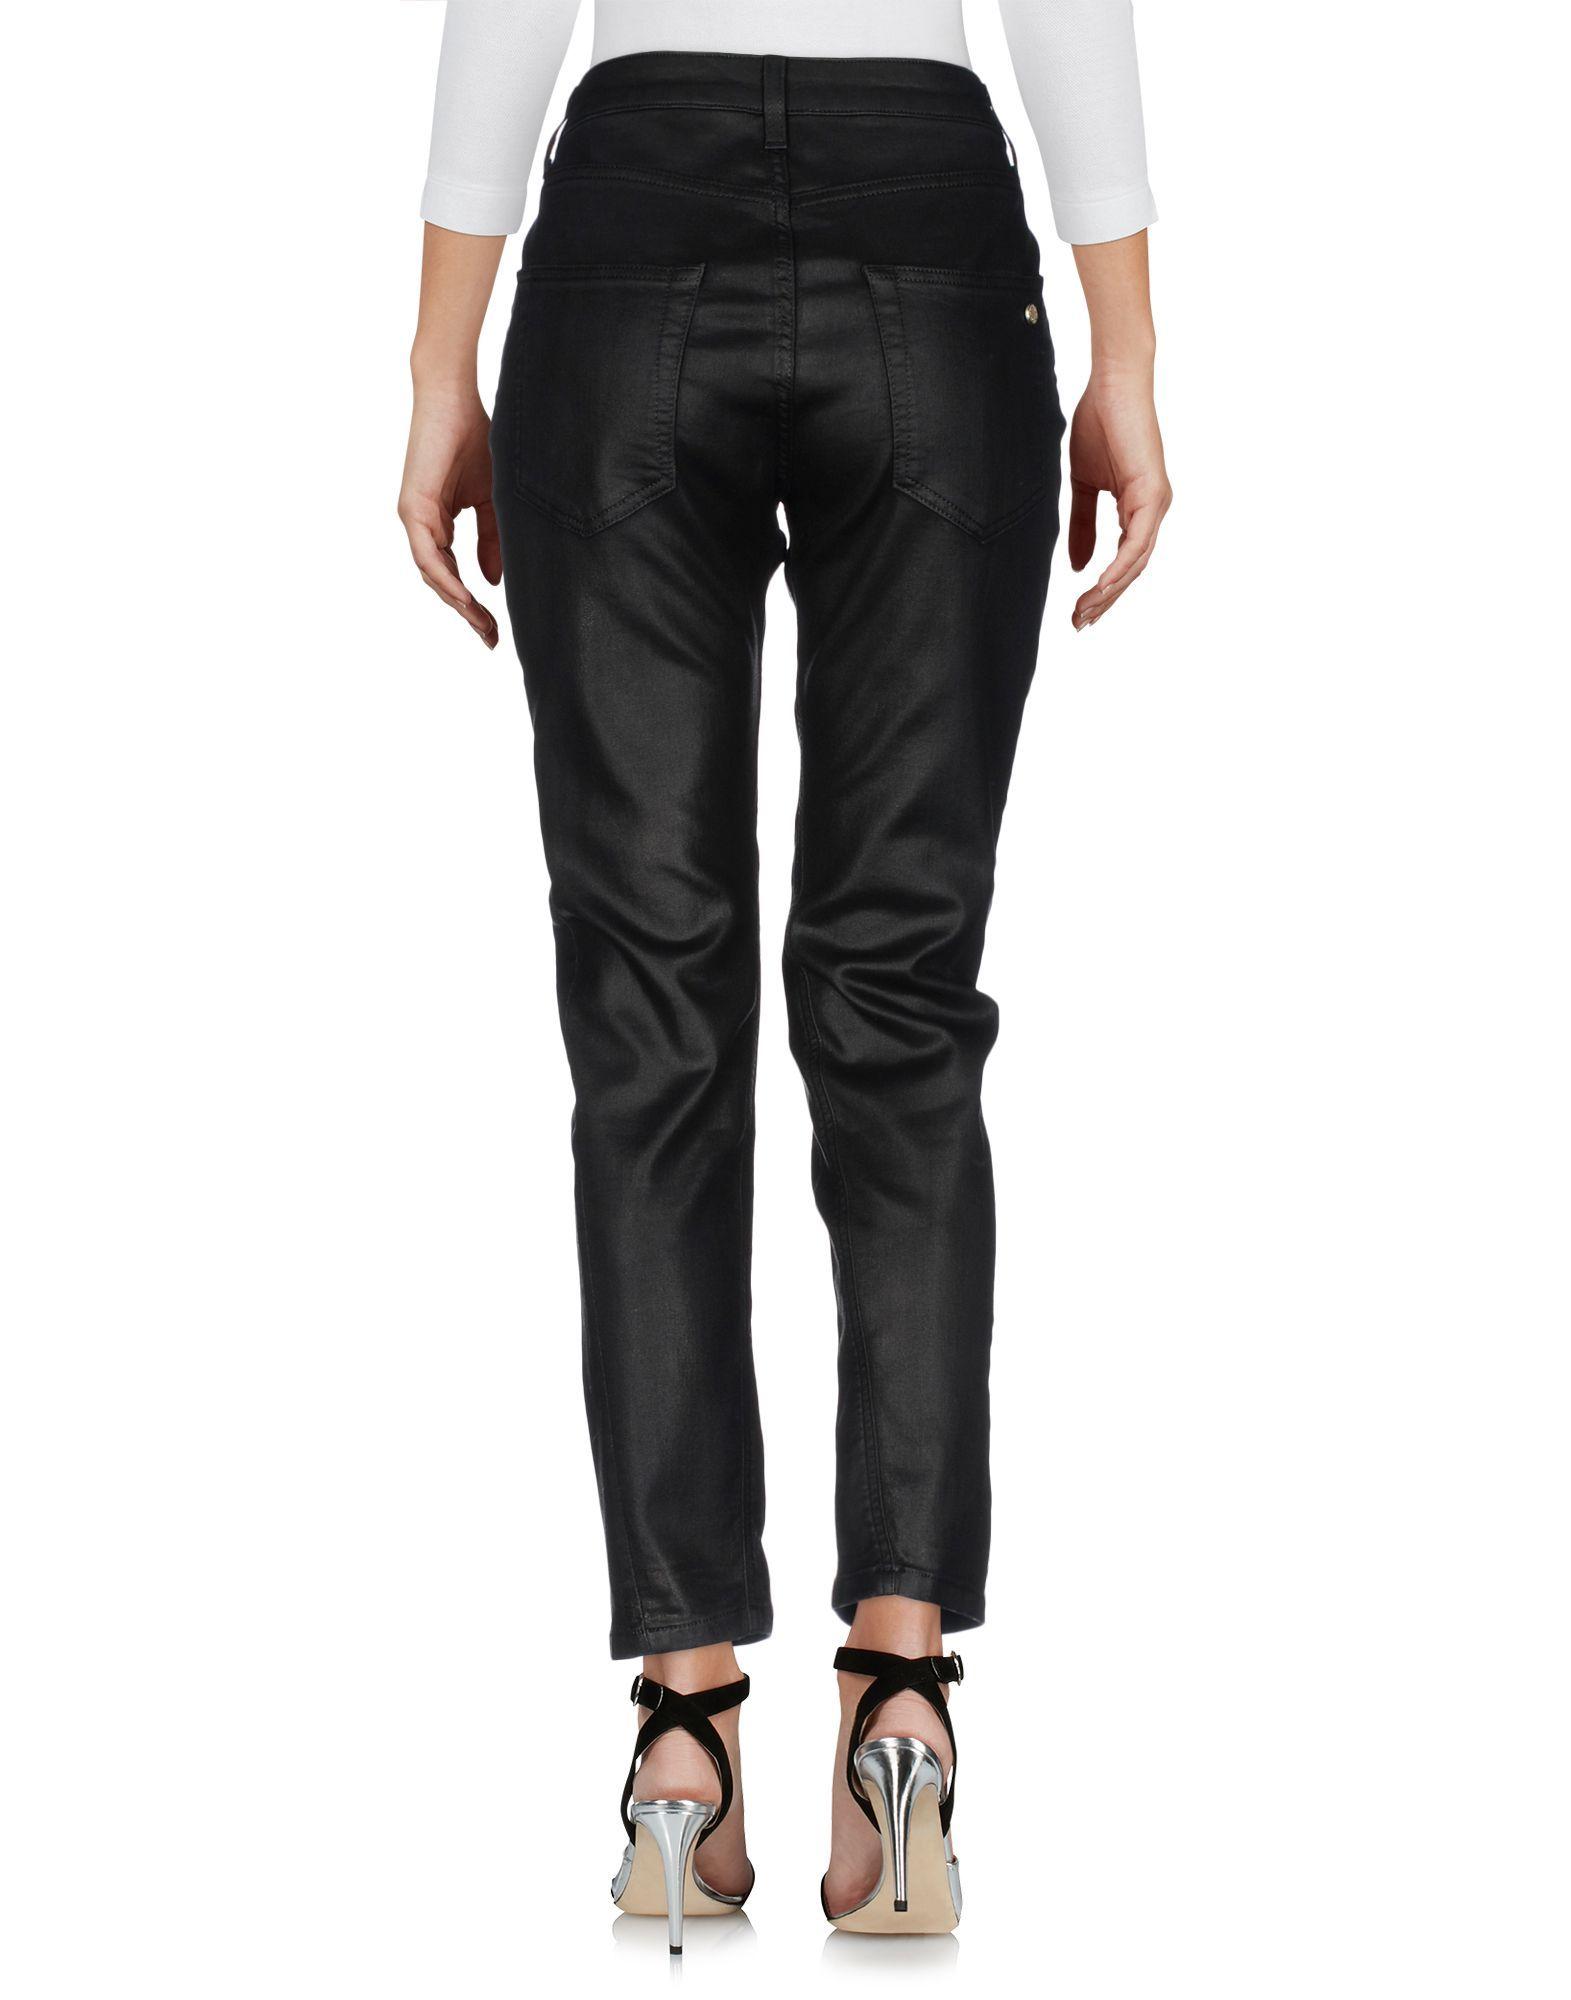 Manila Grace Black Cotton Coated Jeans